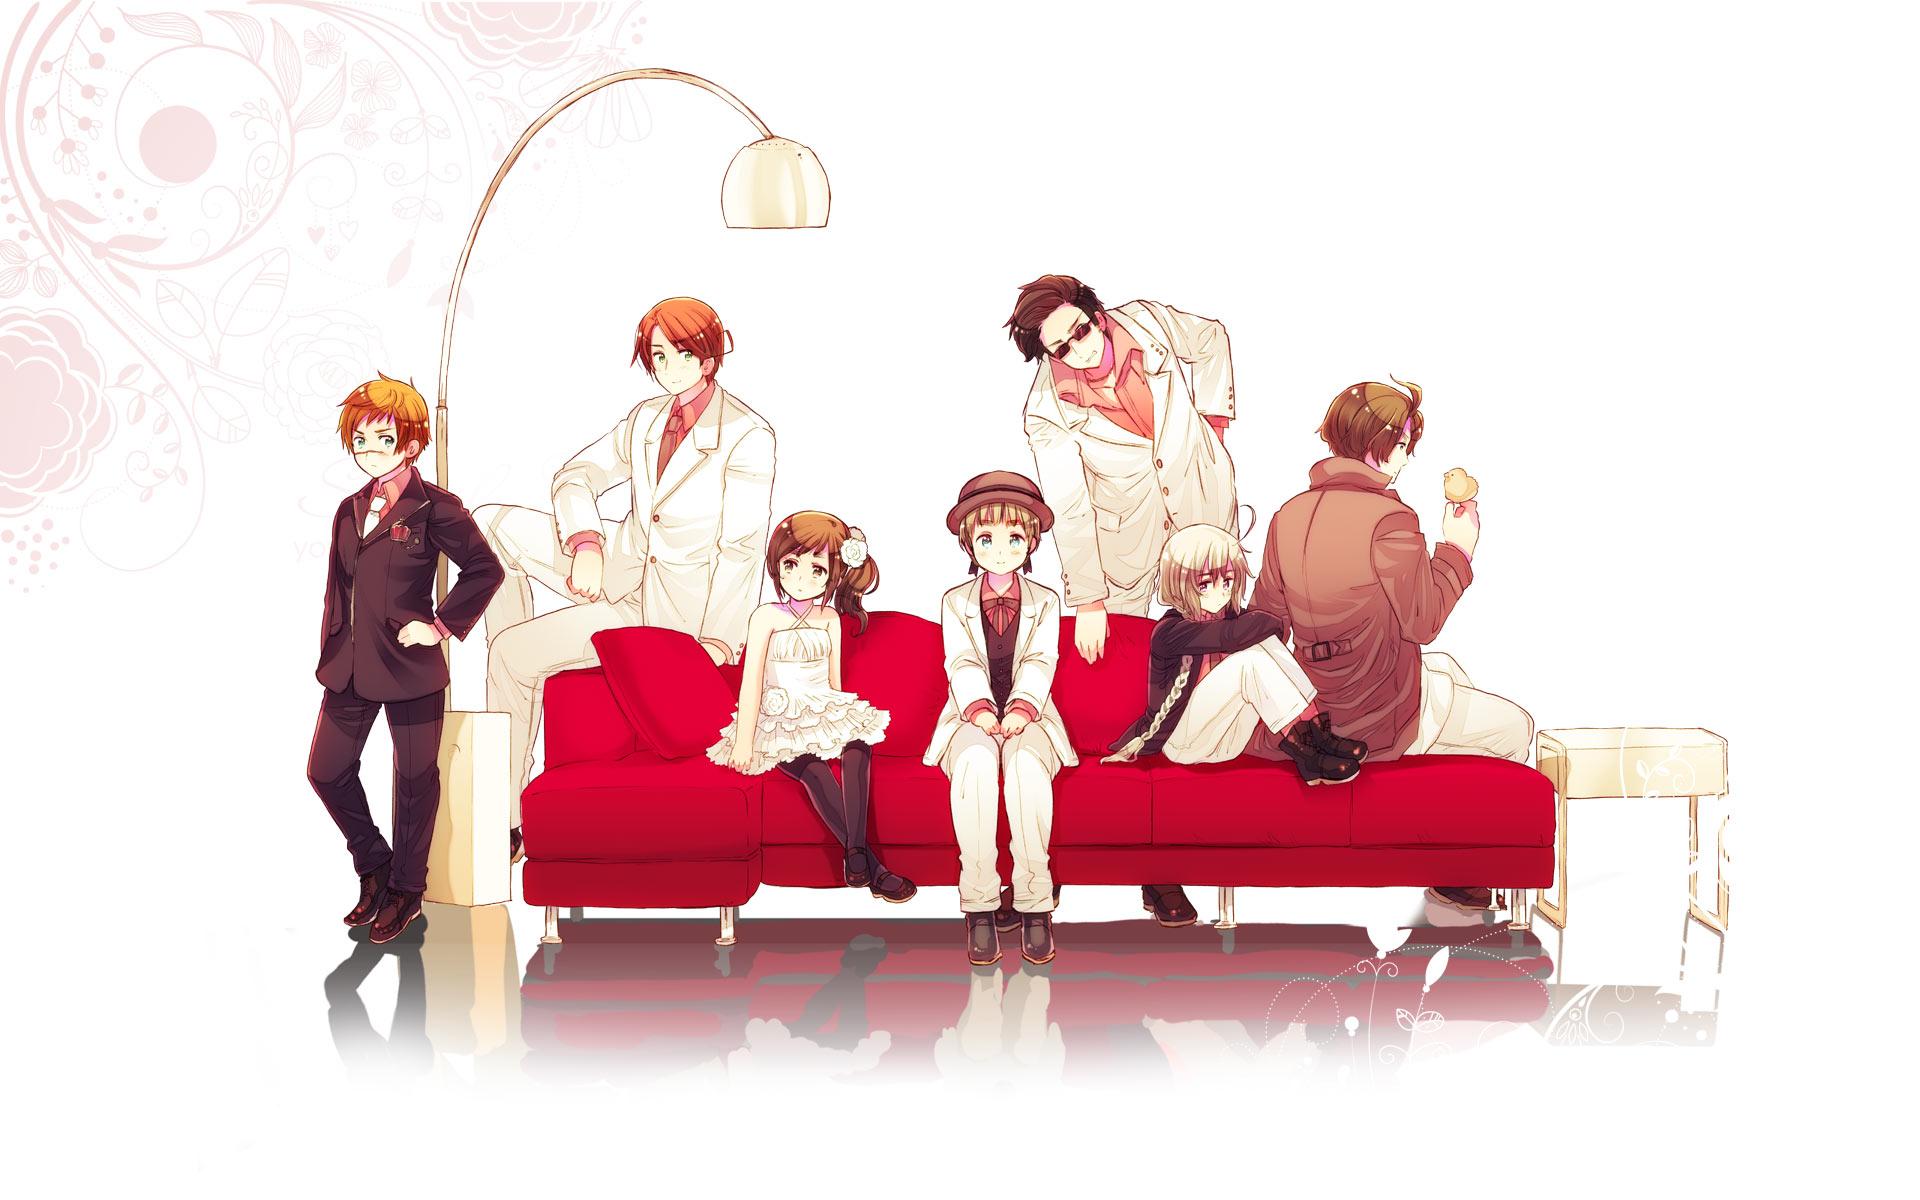 Cute Cartoon Family Wallpaper Micronations Wallpaper 898543 Zerochan Anime Image Board